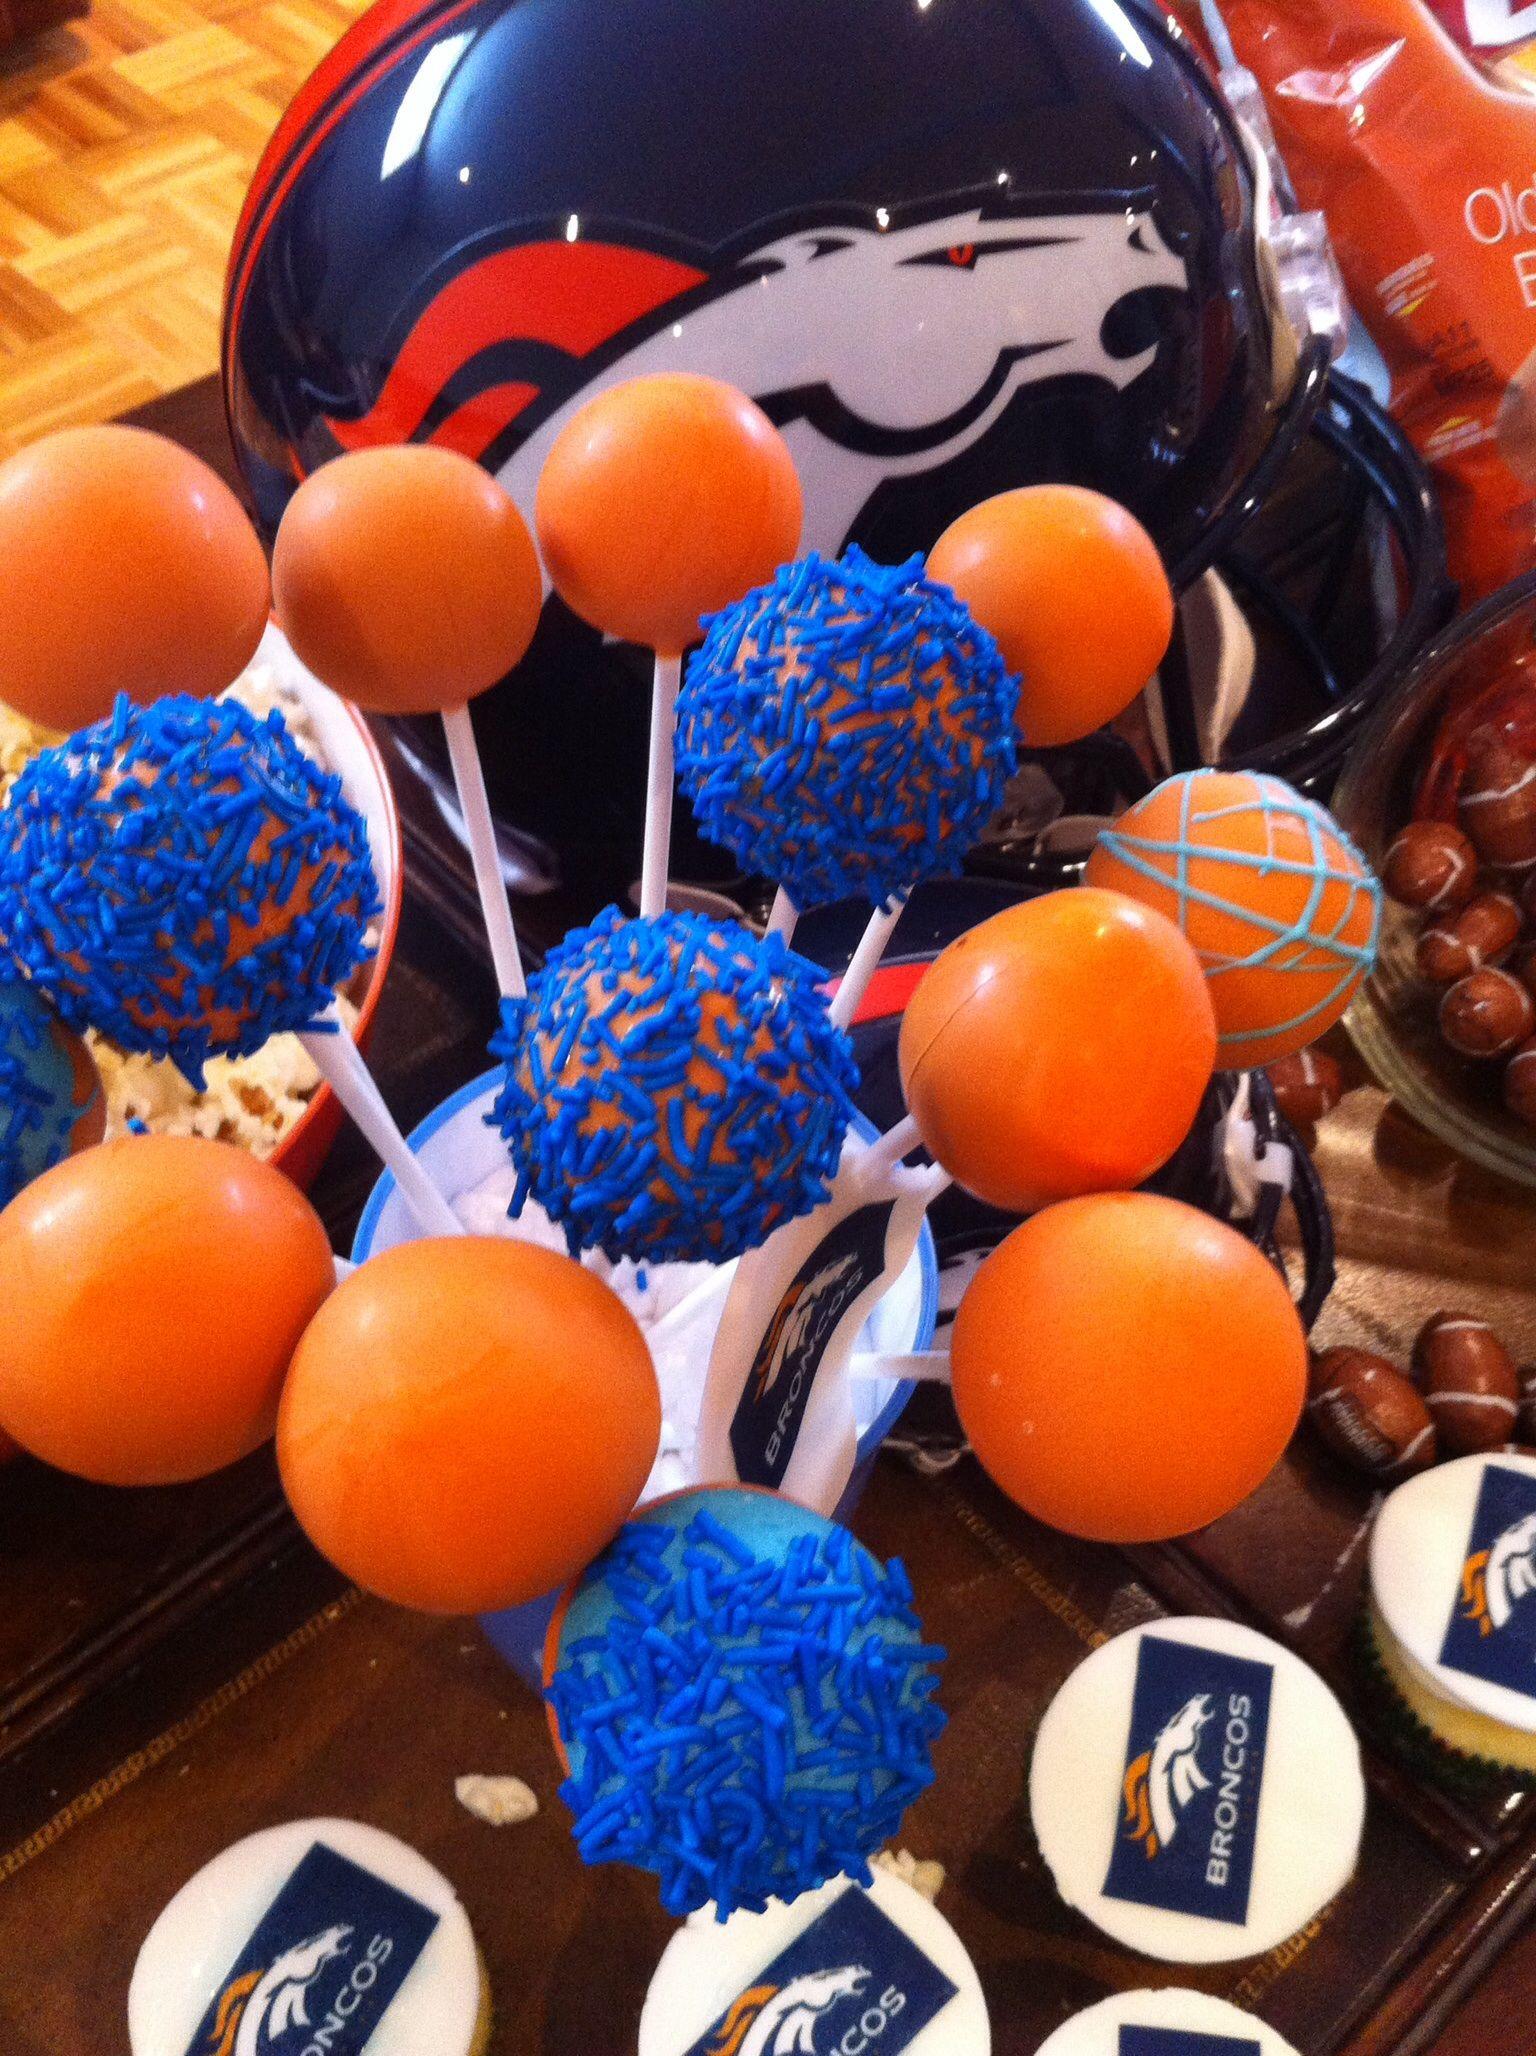 Cake Pops Denver Broncos Birthday Theme Nerf Party 8th